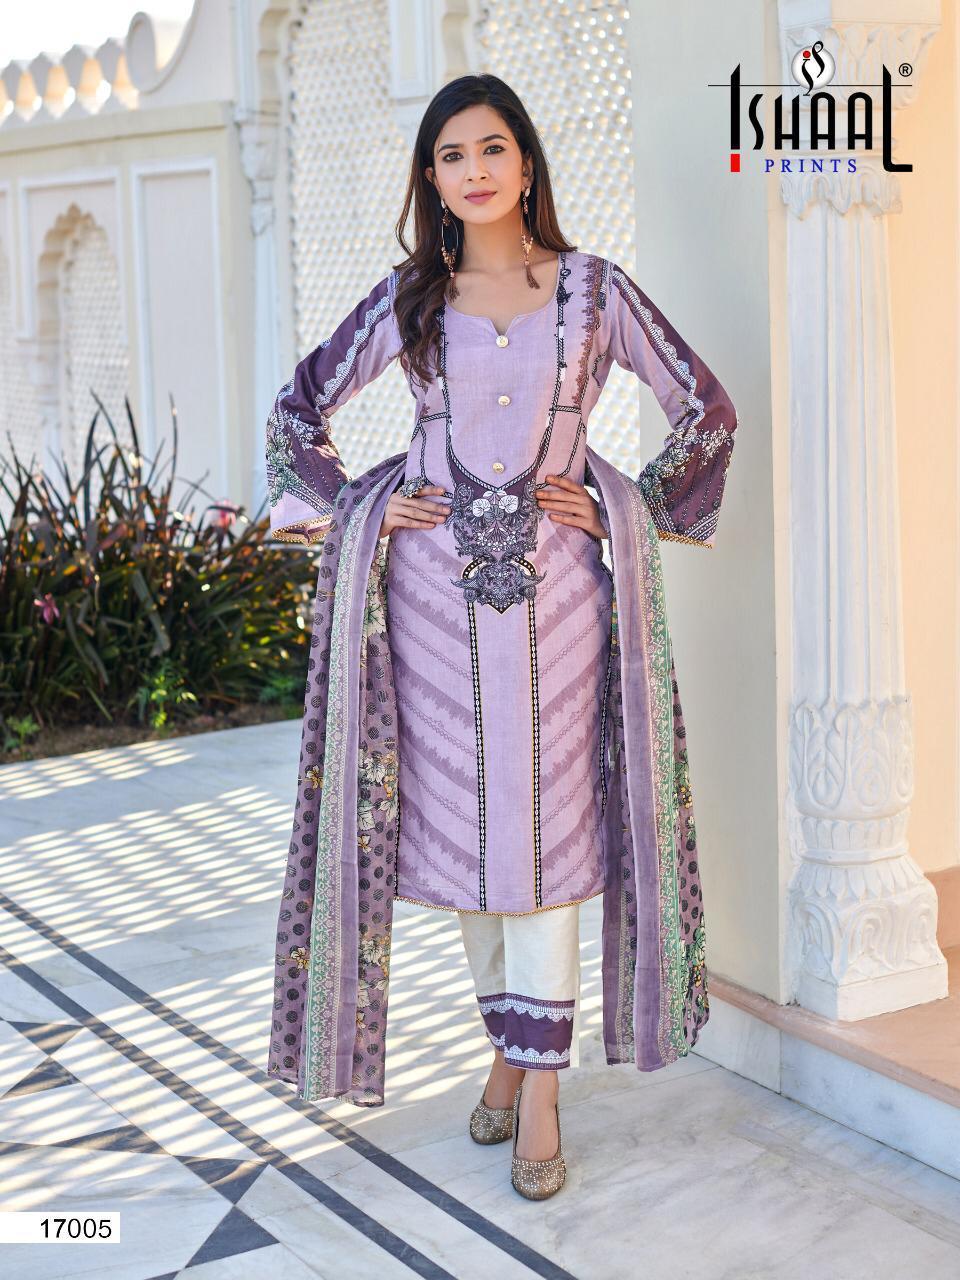 Ishaal Gulmohar Vol 17 Salwar Suit Wholesale Catalog 10 Pcs 3 - Ishaal Gulmohar Vol 17 Salwar Suit Wholesale Catalog 10 Pcs